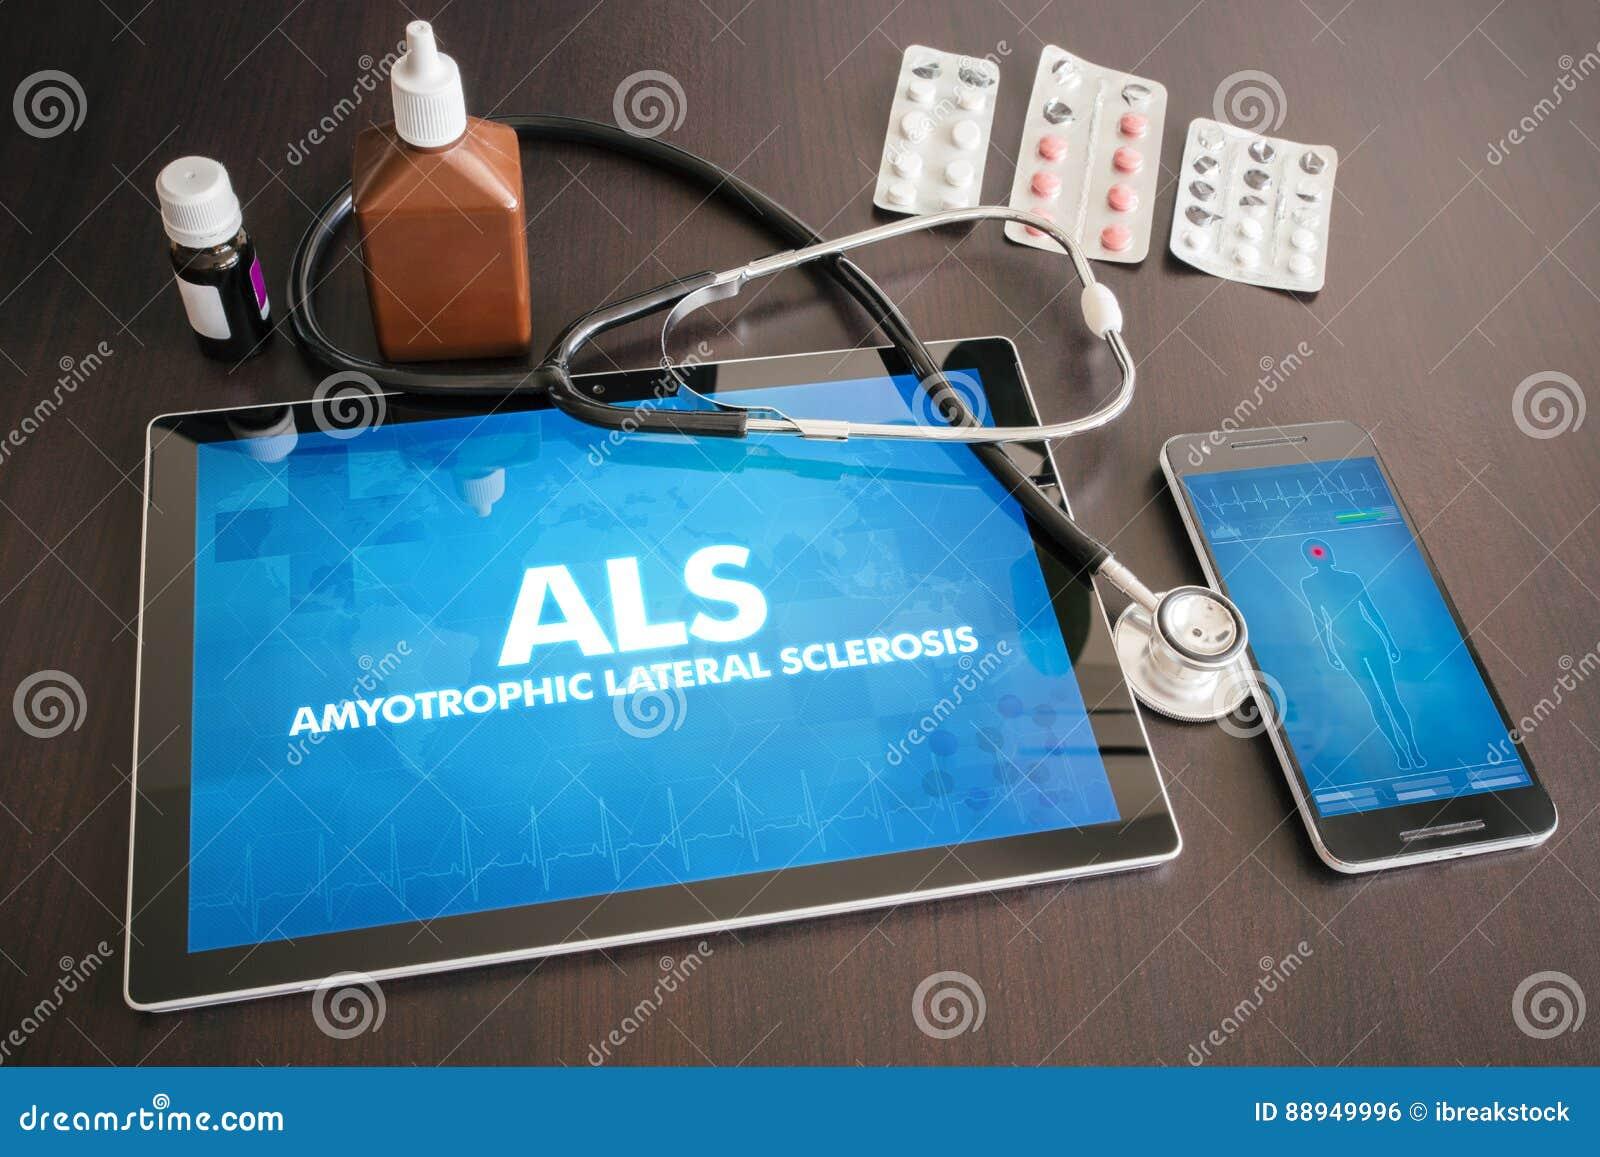 ALS (neurological disorder) diagnosis medical concept on tablet